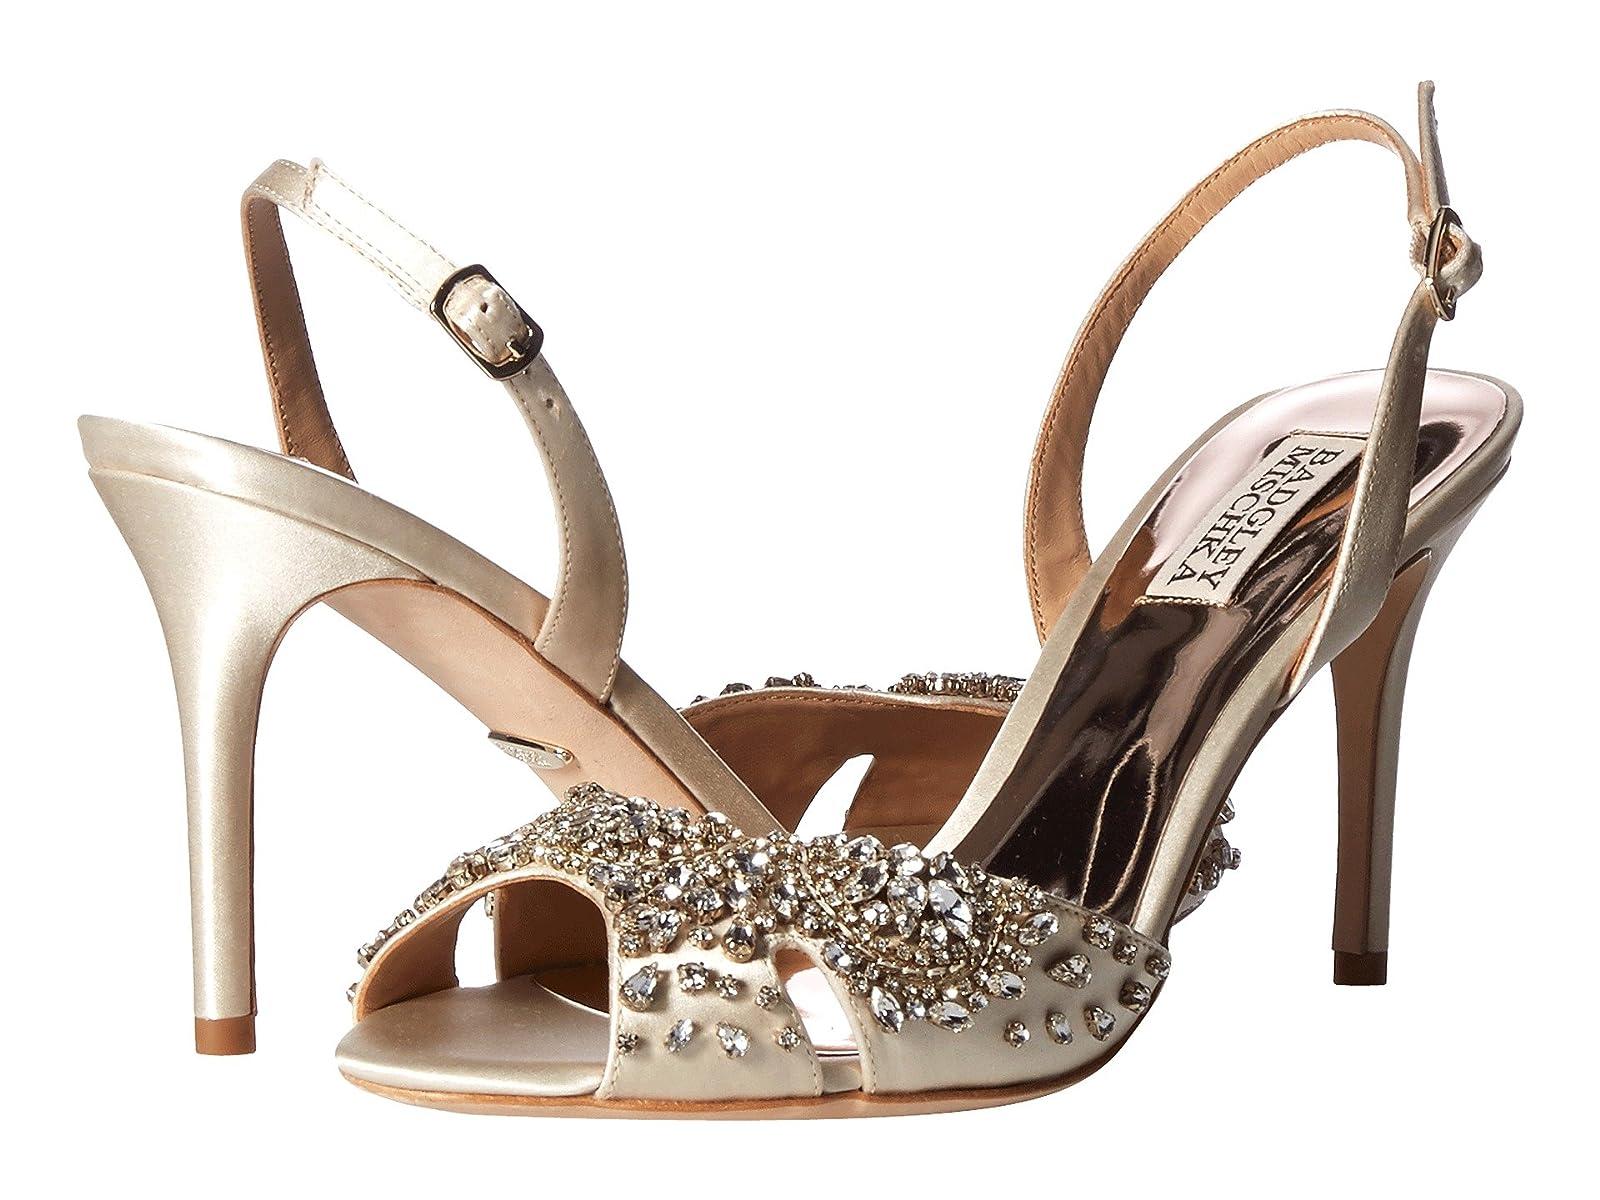 Badgley Mischka PaulaAtmospheric grades have affordable shoes